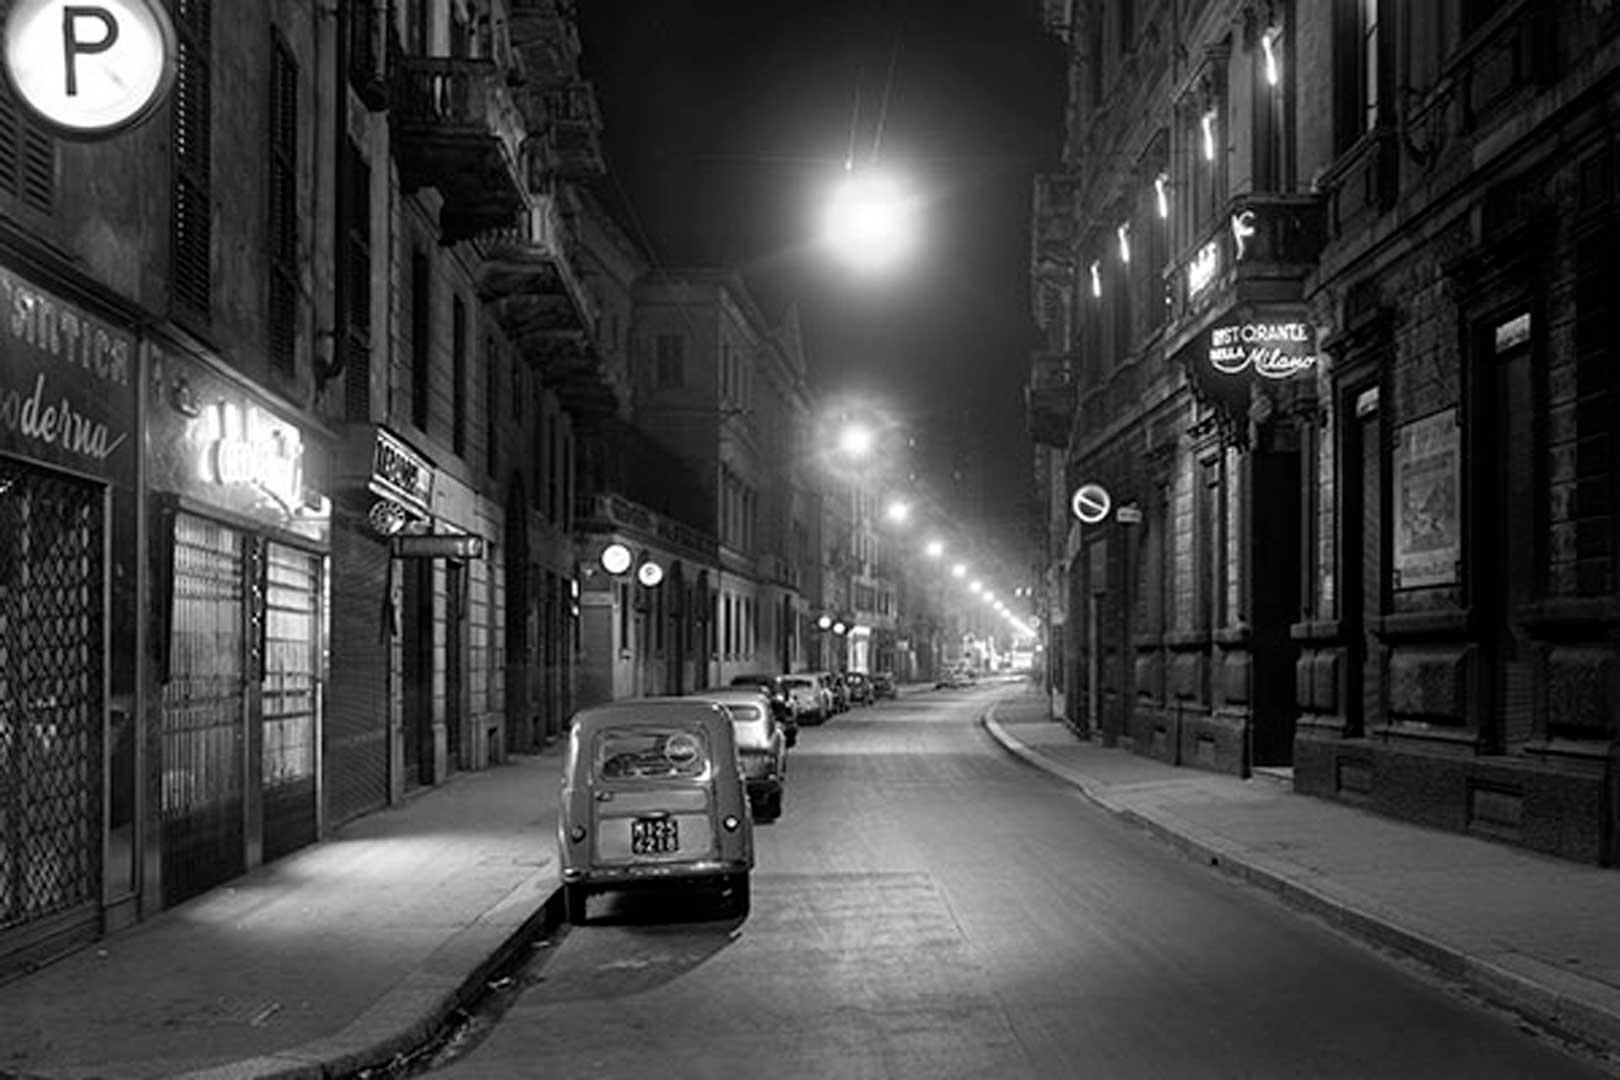 Milano e la Mala